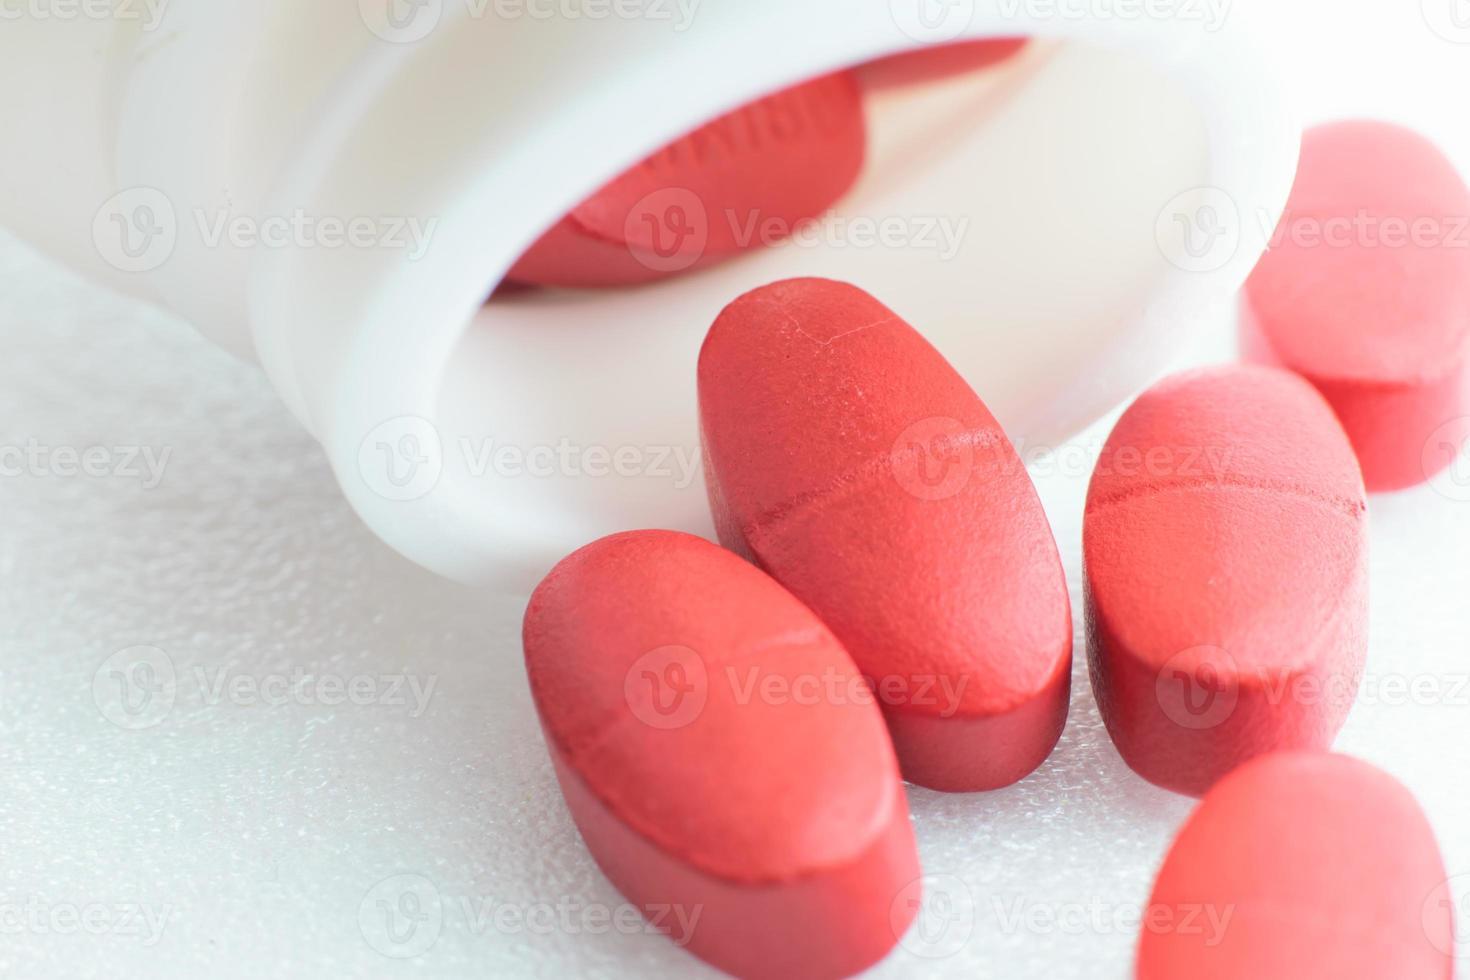 pastillas rojas aisladas foto